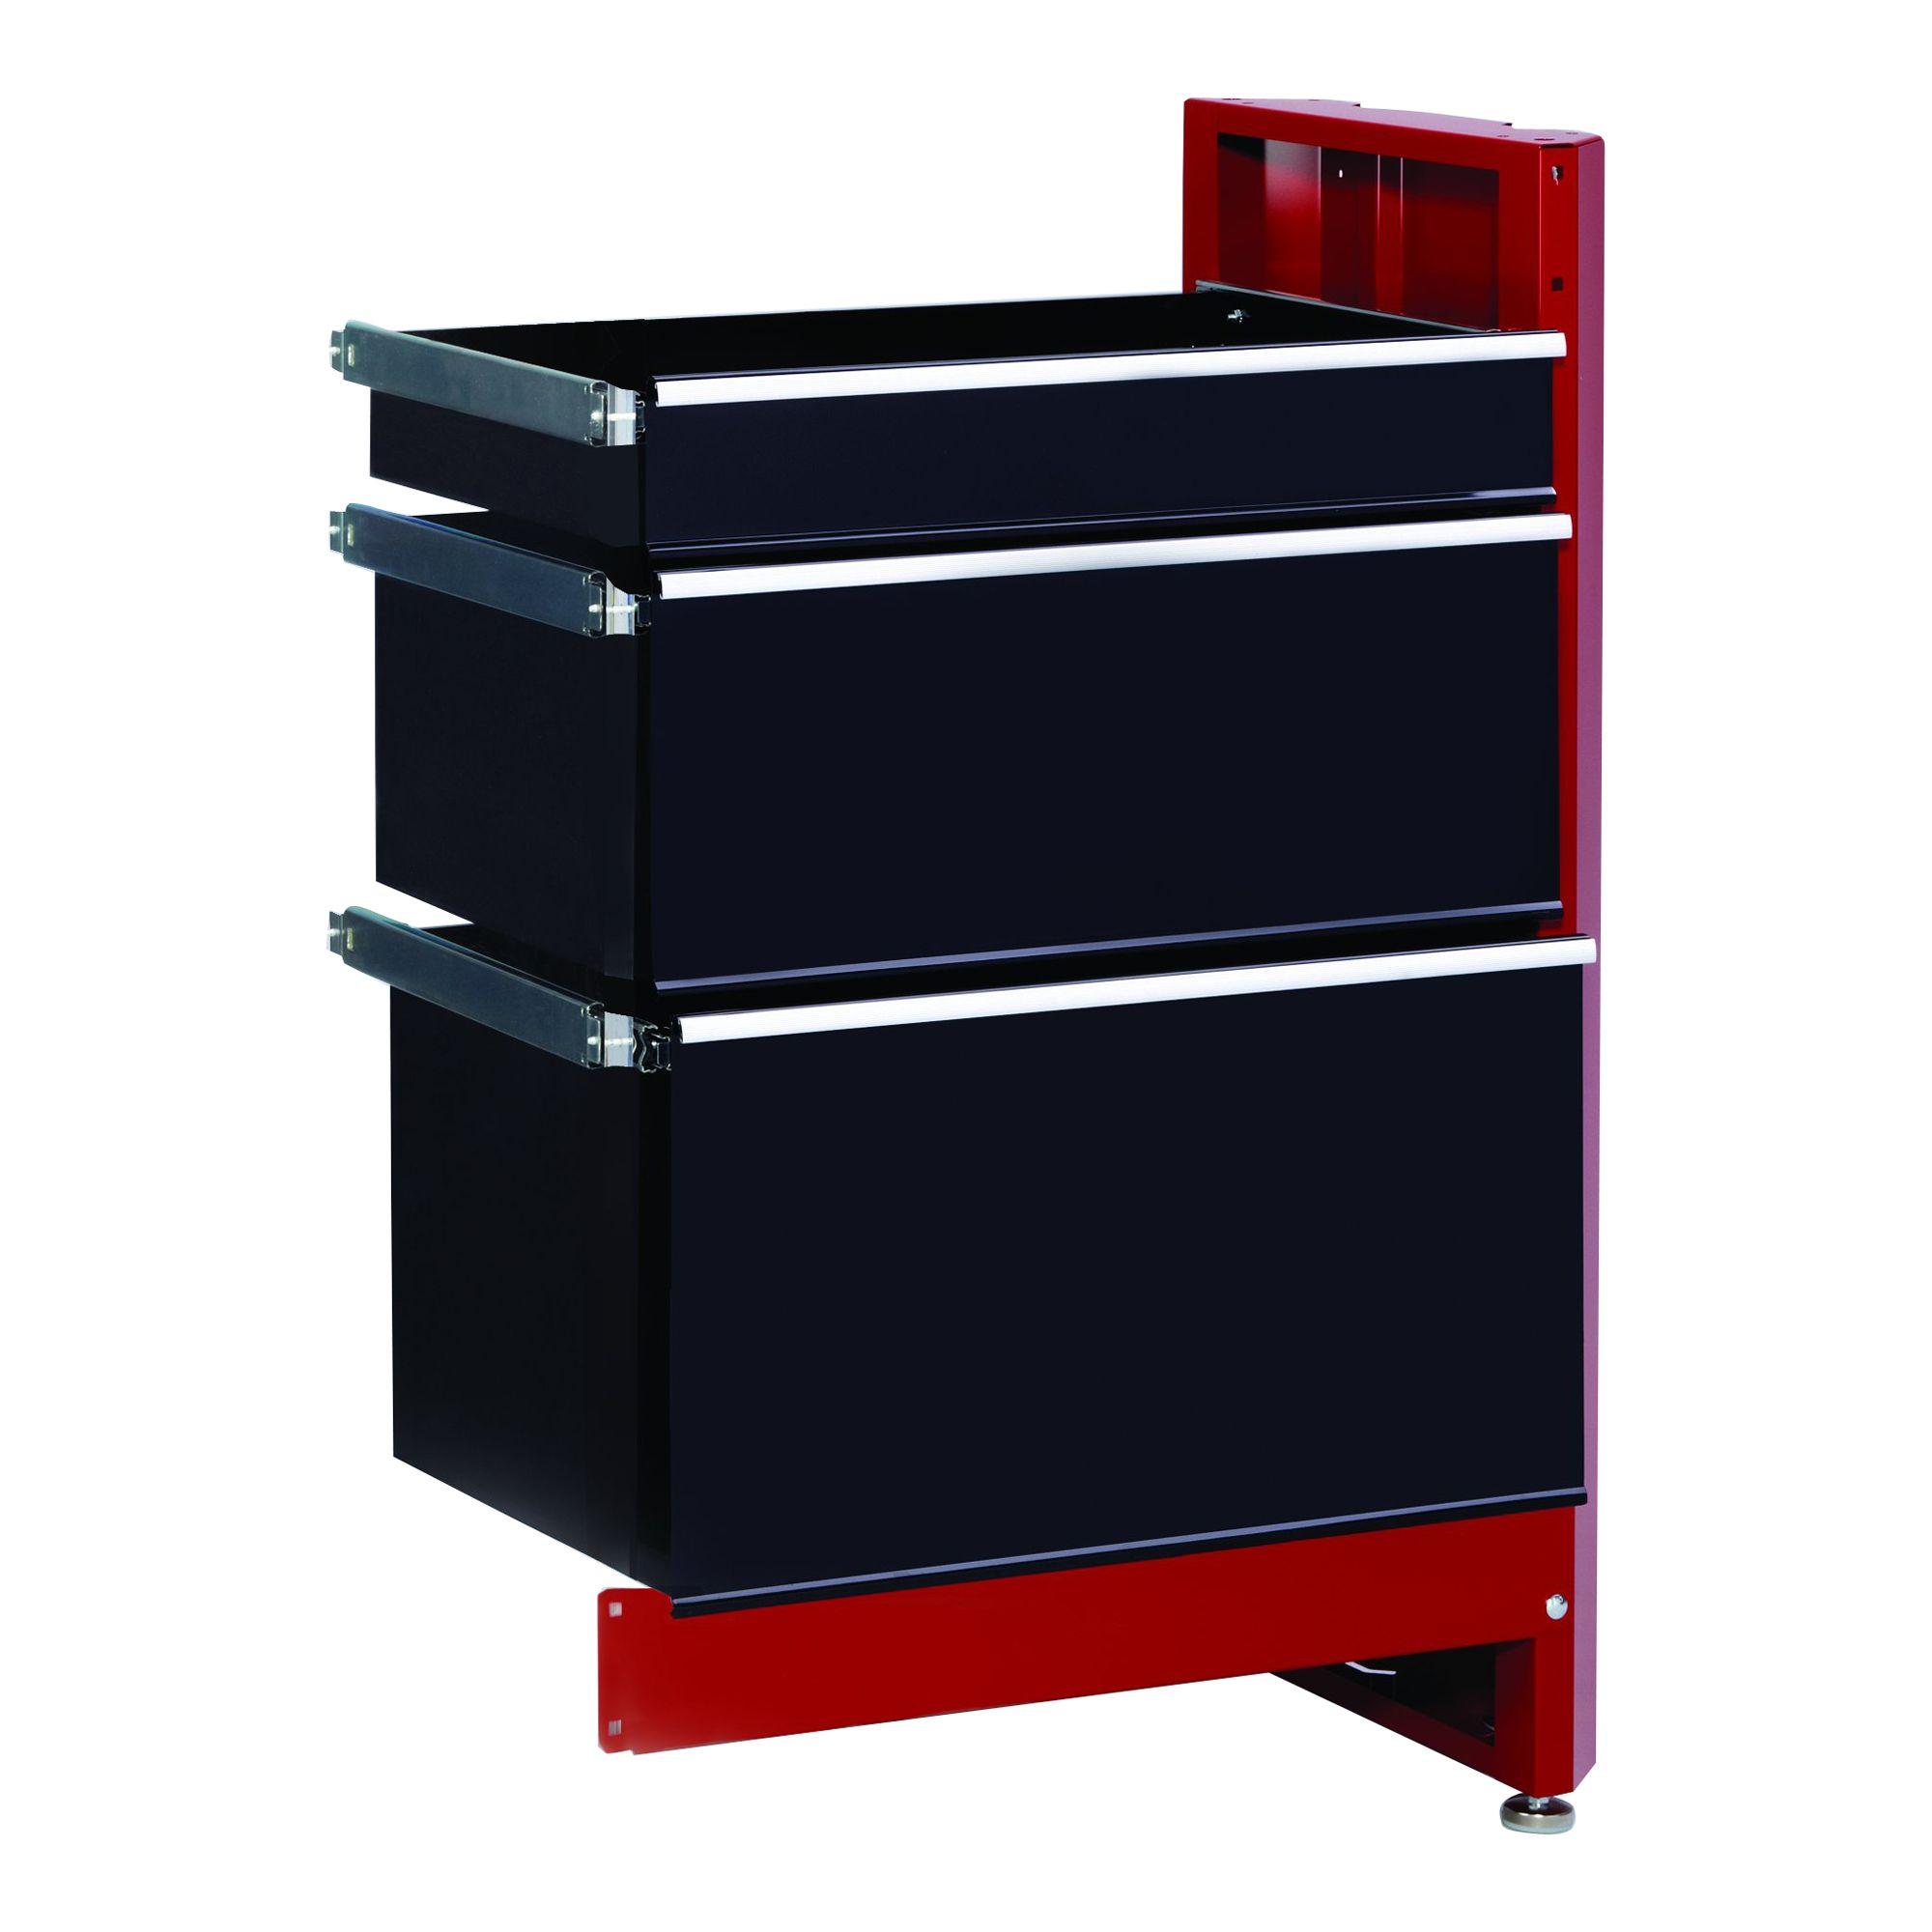 Craftsman 3 Drawer Workbench Module Red Black